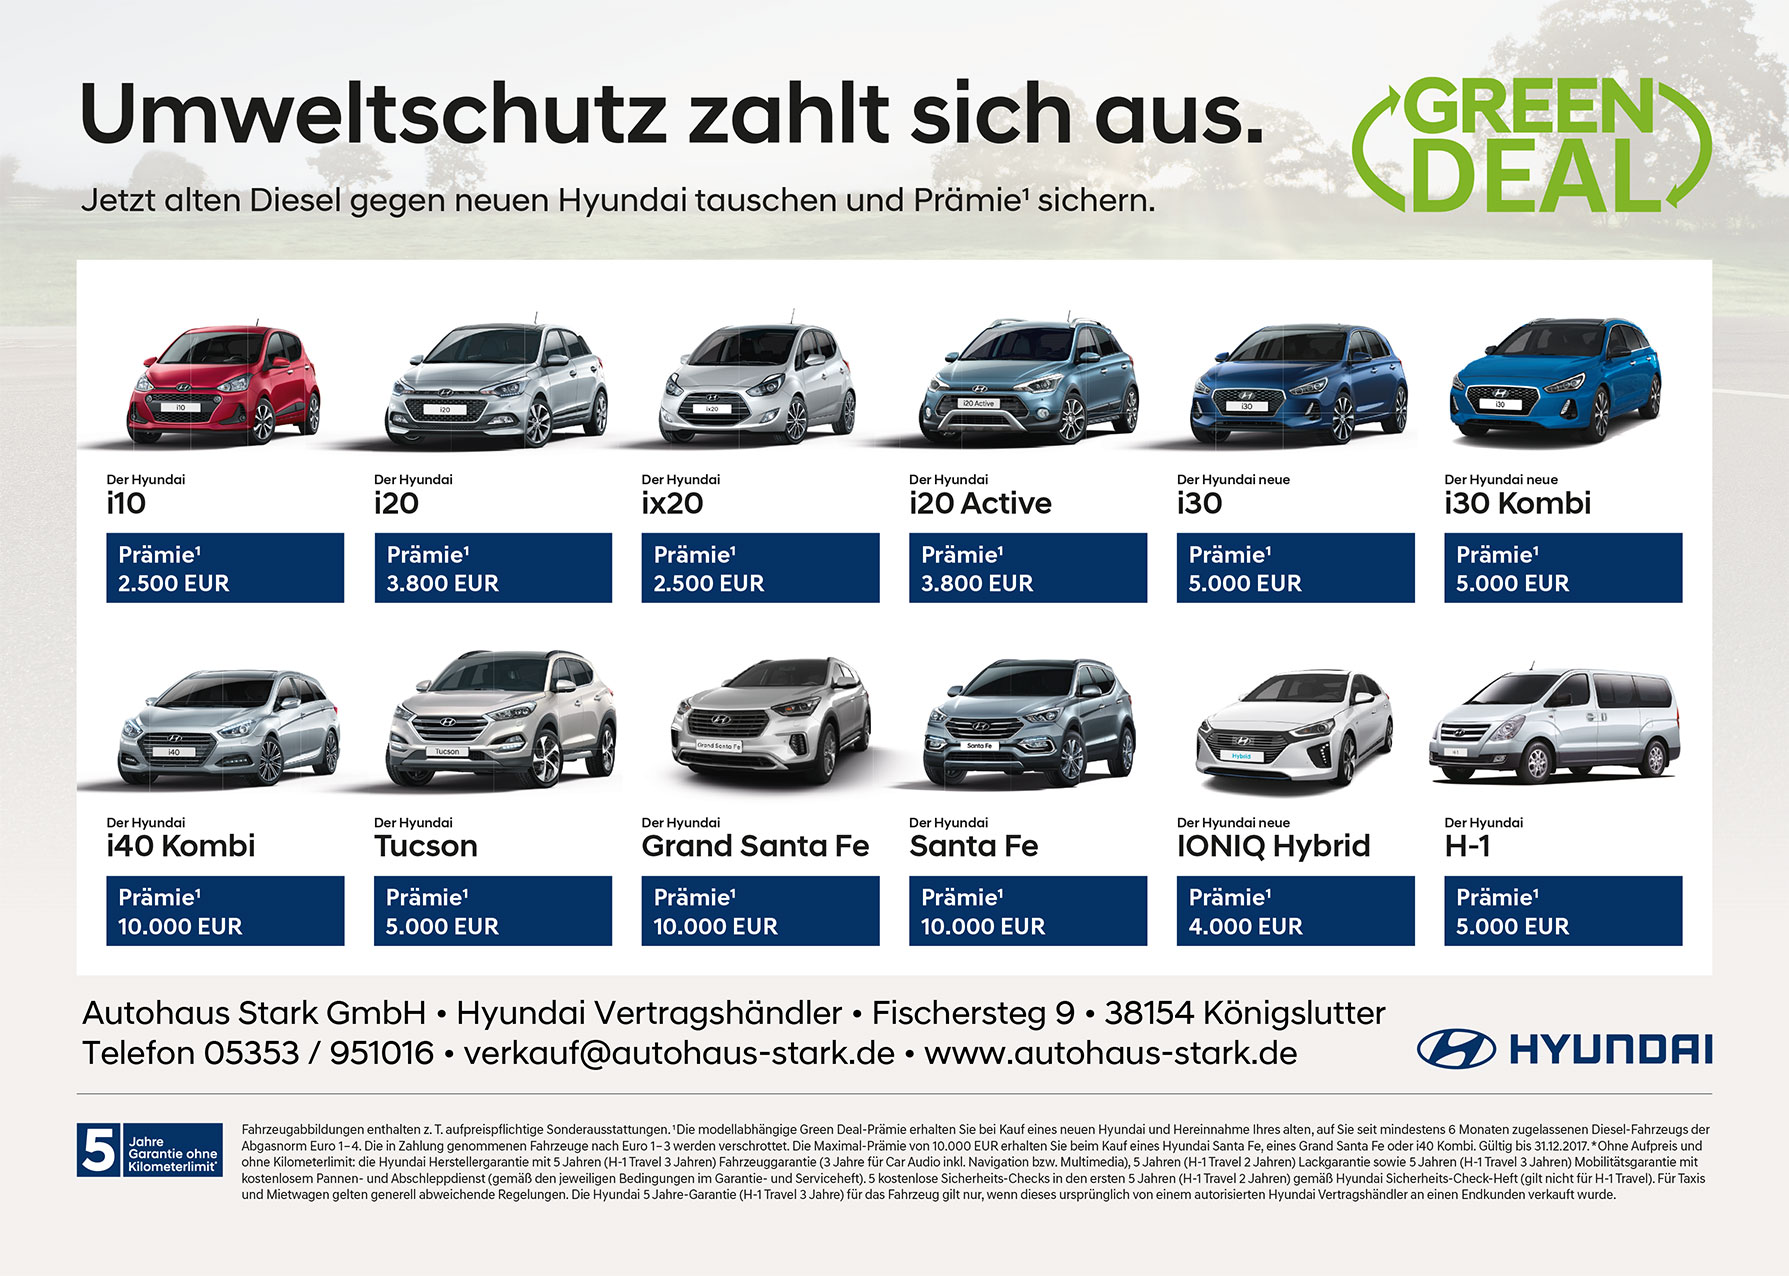 Hyundai Green Deals